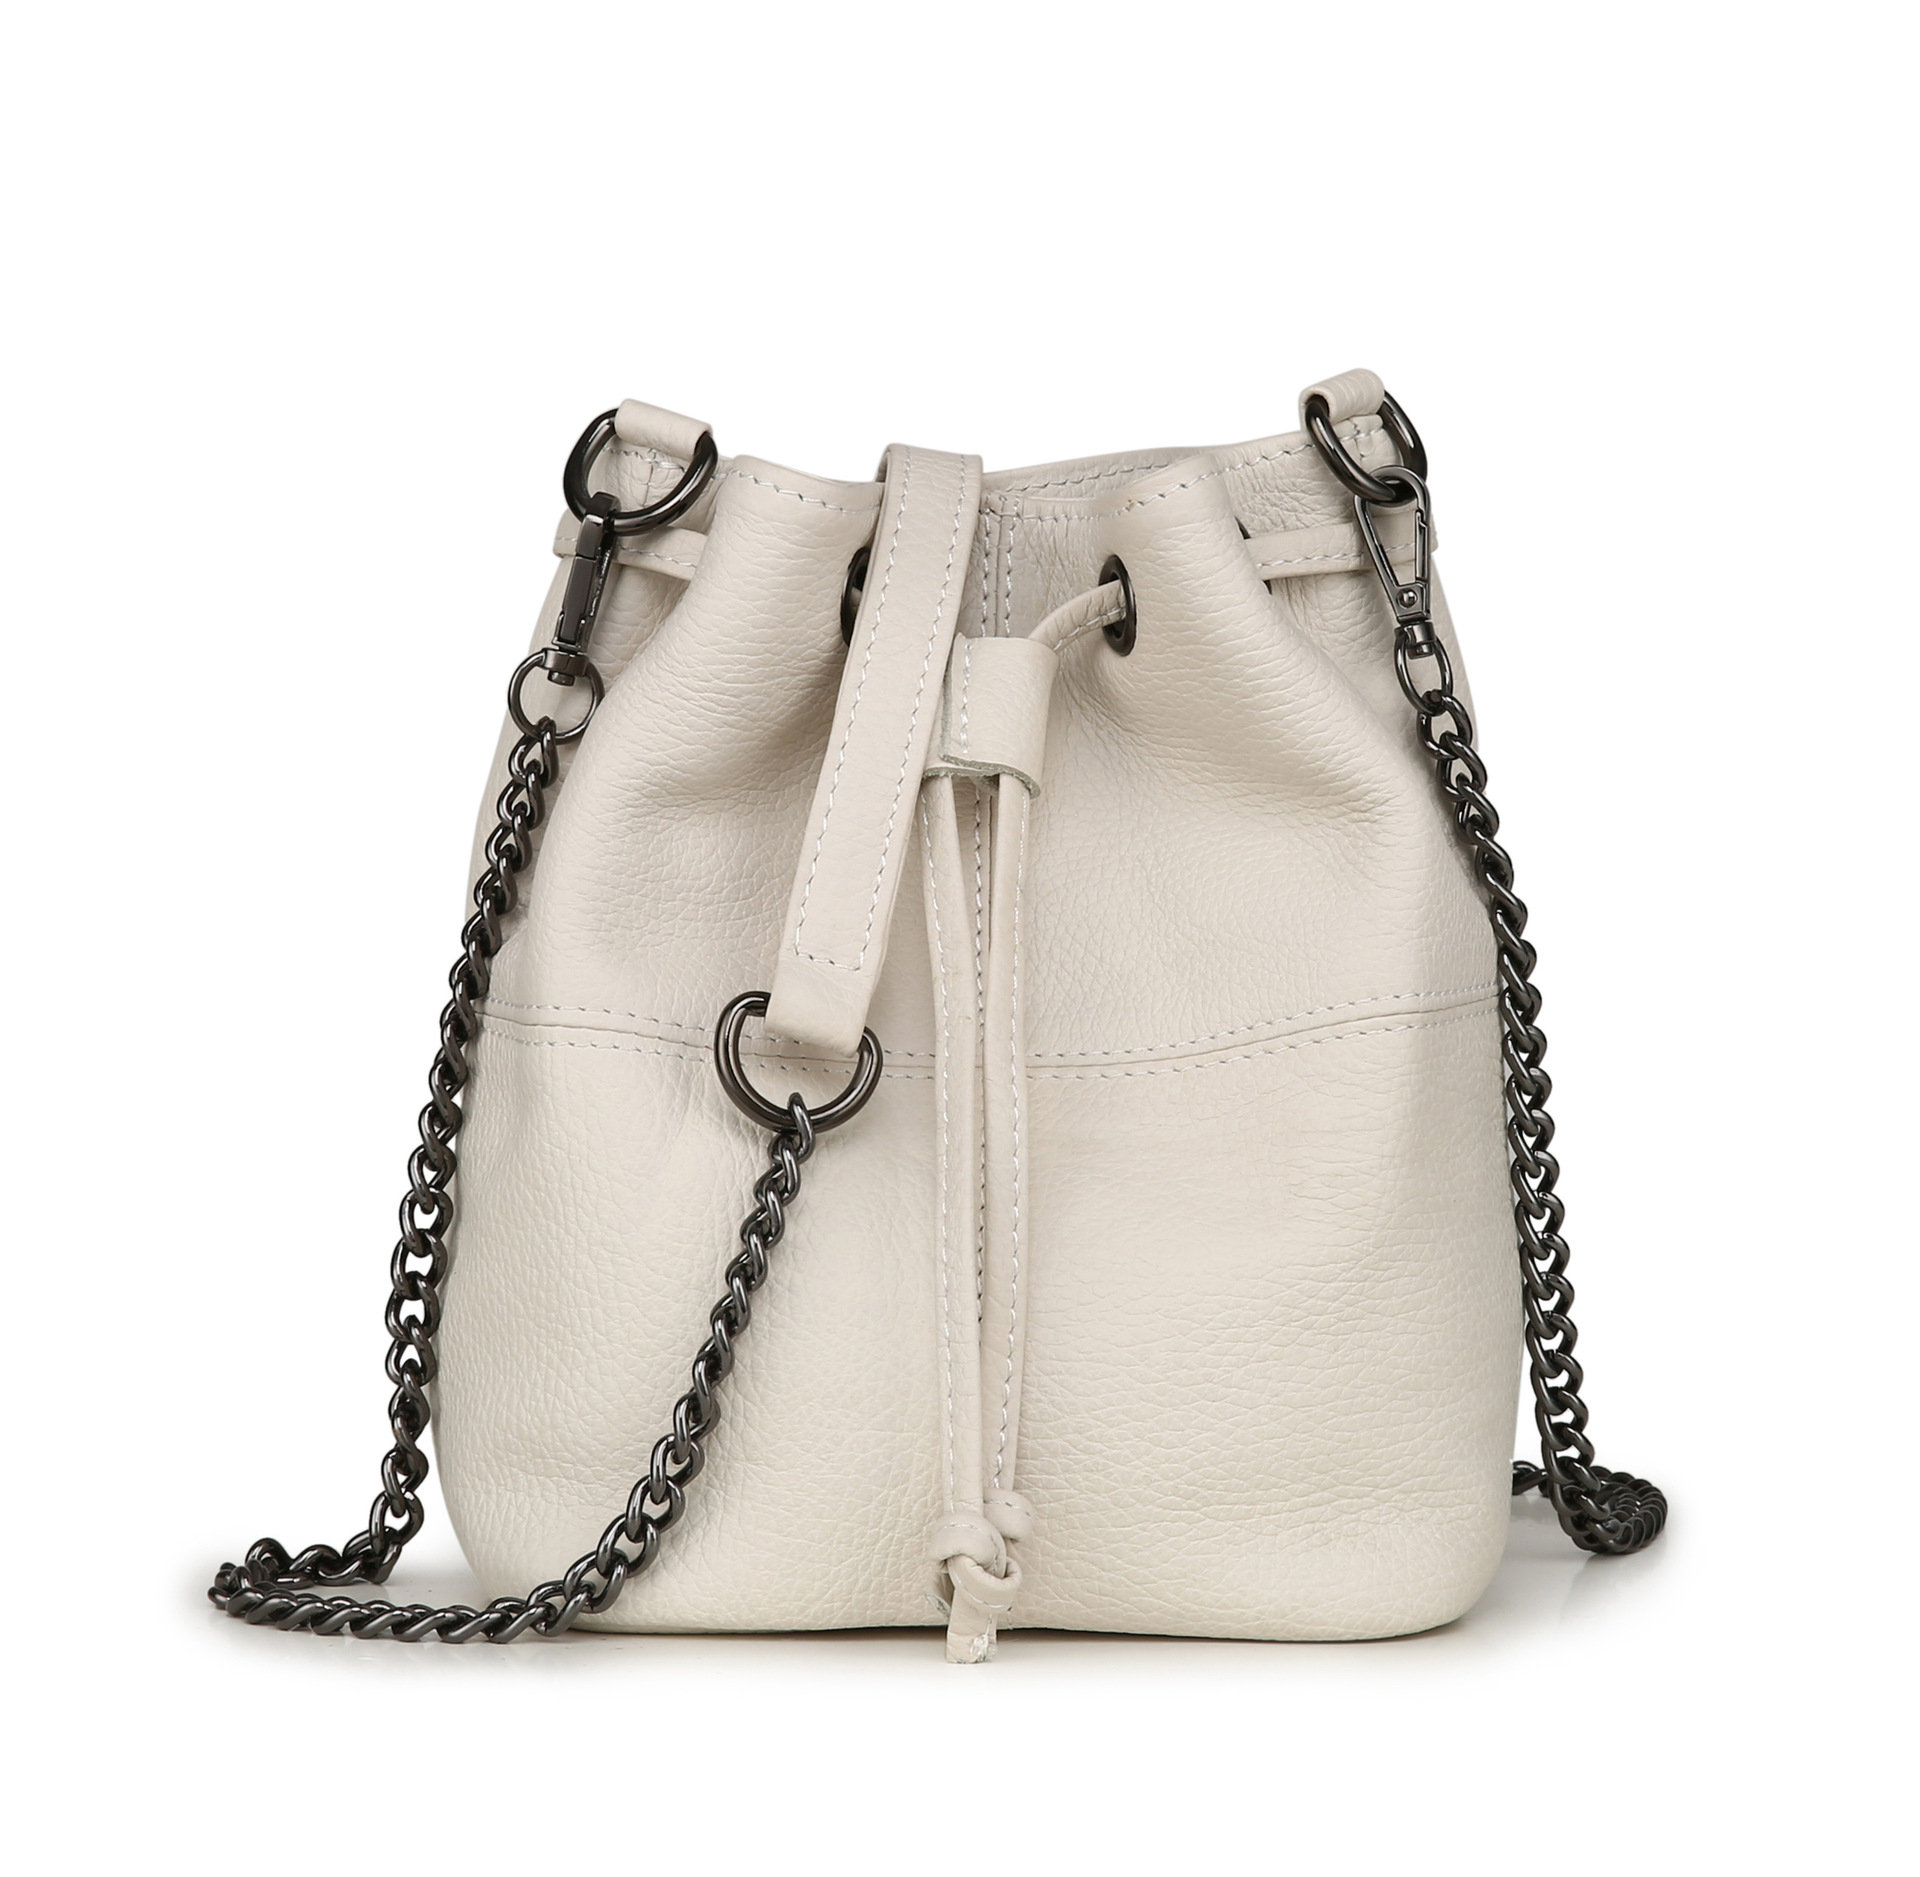 2018 New Arrival Female Bucket Bags Genuine Leather Handbags Famous Brand Design Women Messenger Bags Fashion Women Bags стоимость